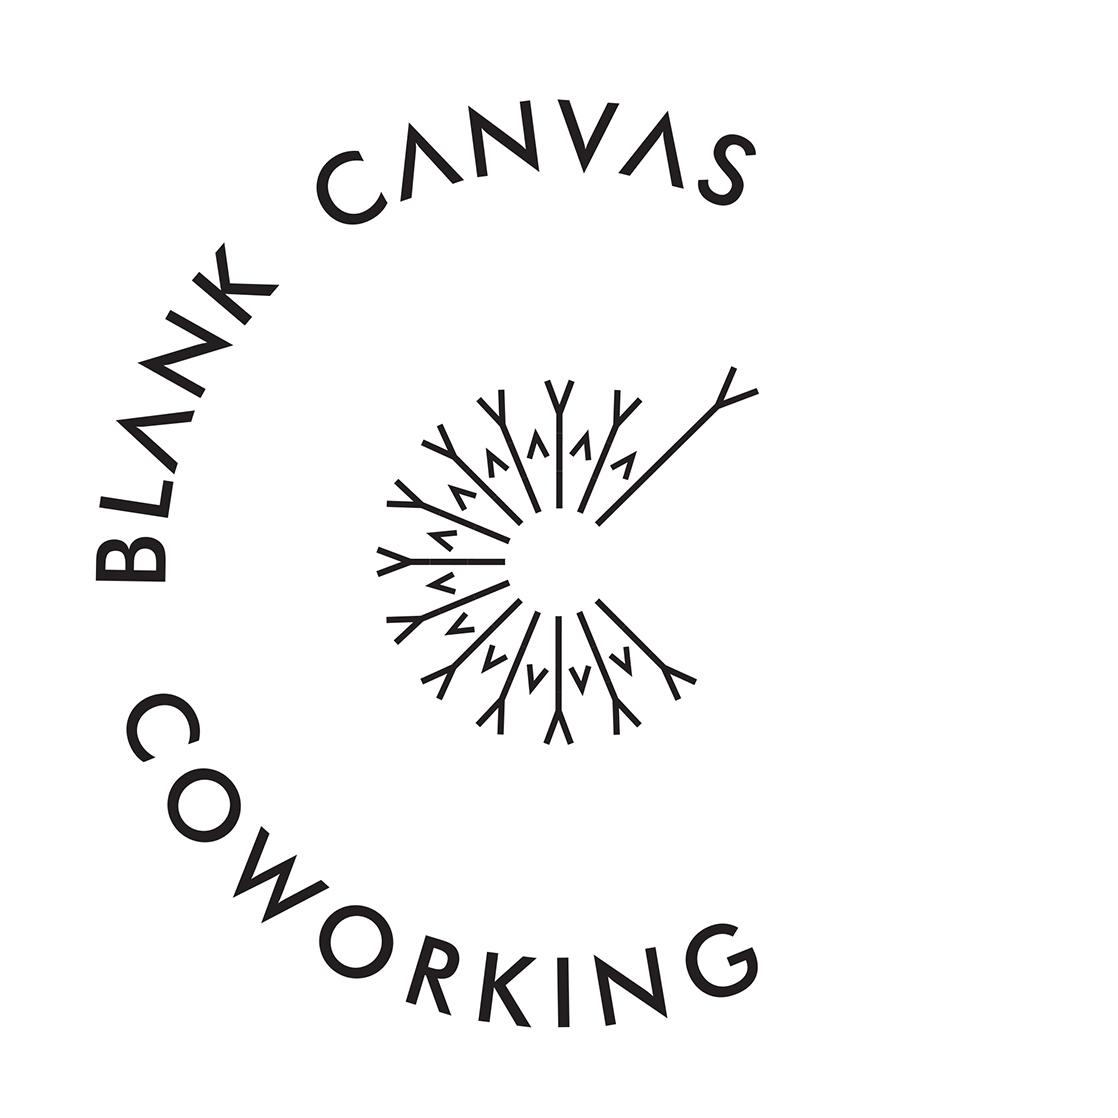 Blank Canvas Coworking logo